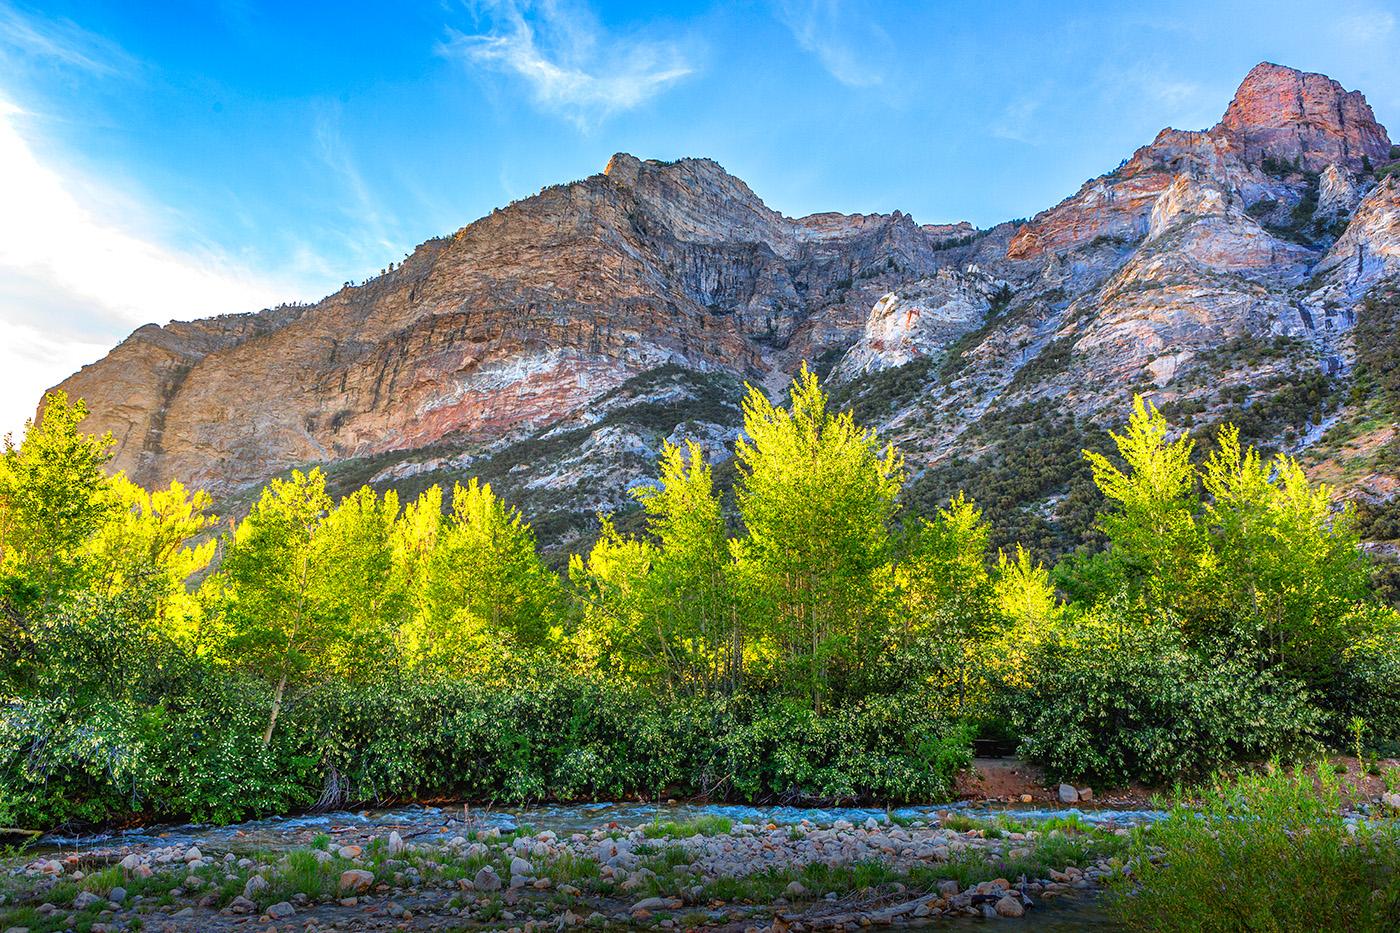 Ruby_Mountains%%US%%Ken_Pfeiffer.jpg